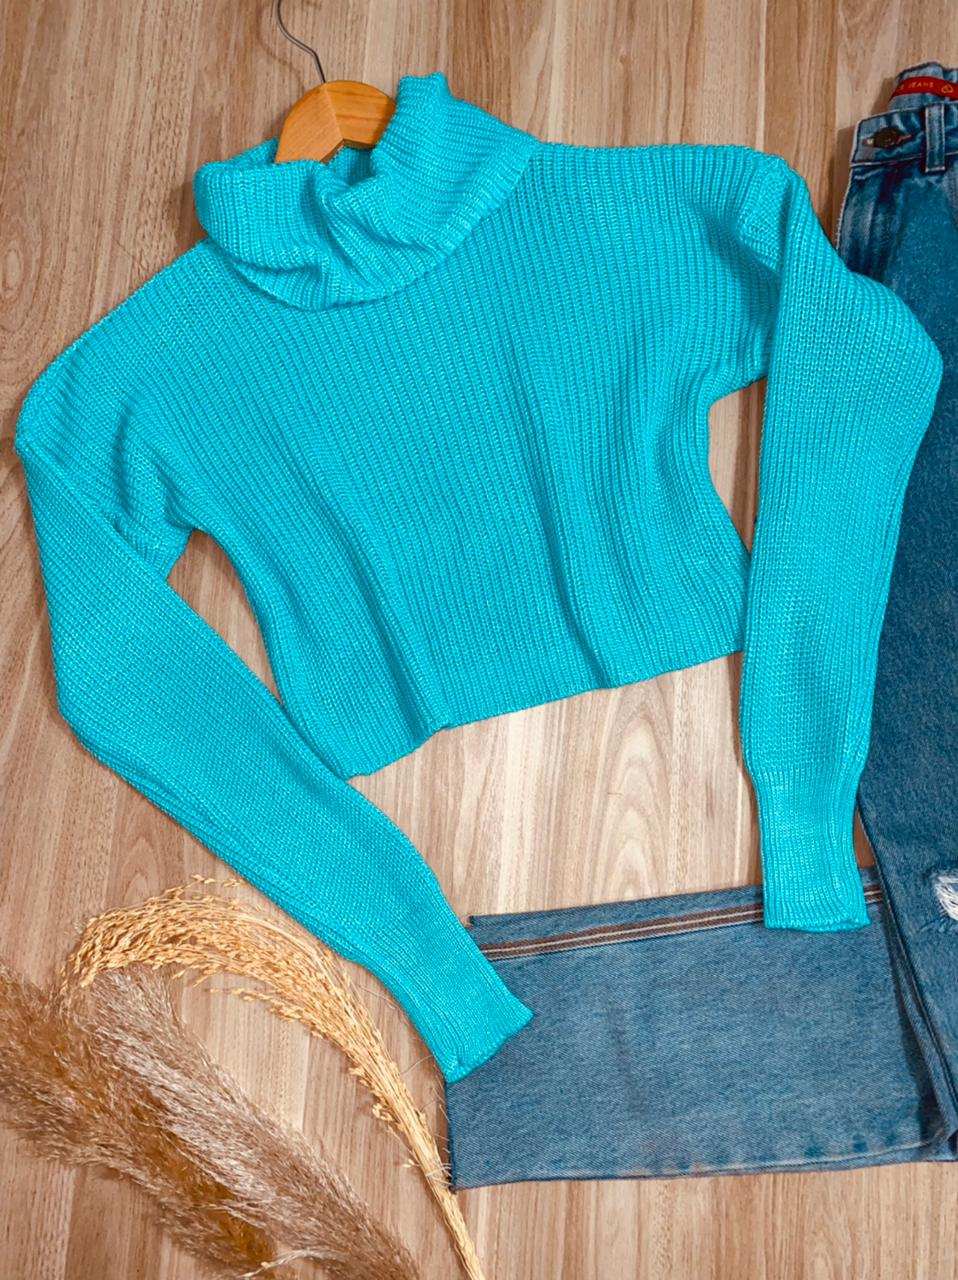 Blusa Tricot Cropped Gola com Punho Thayna